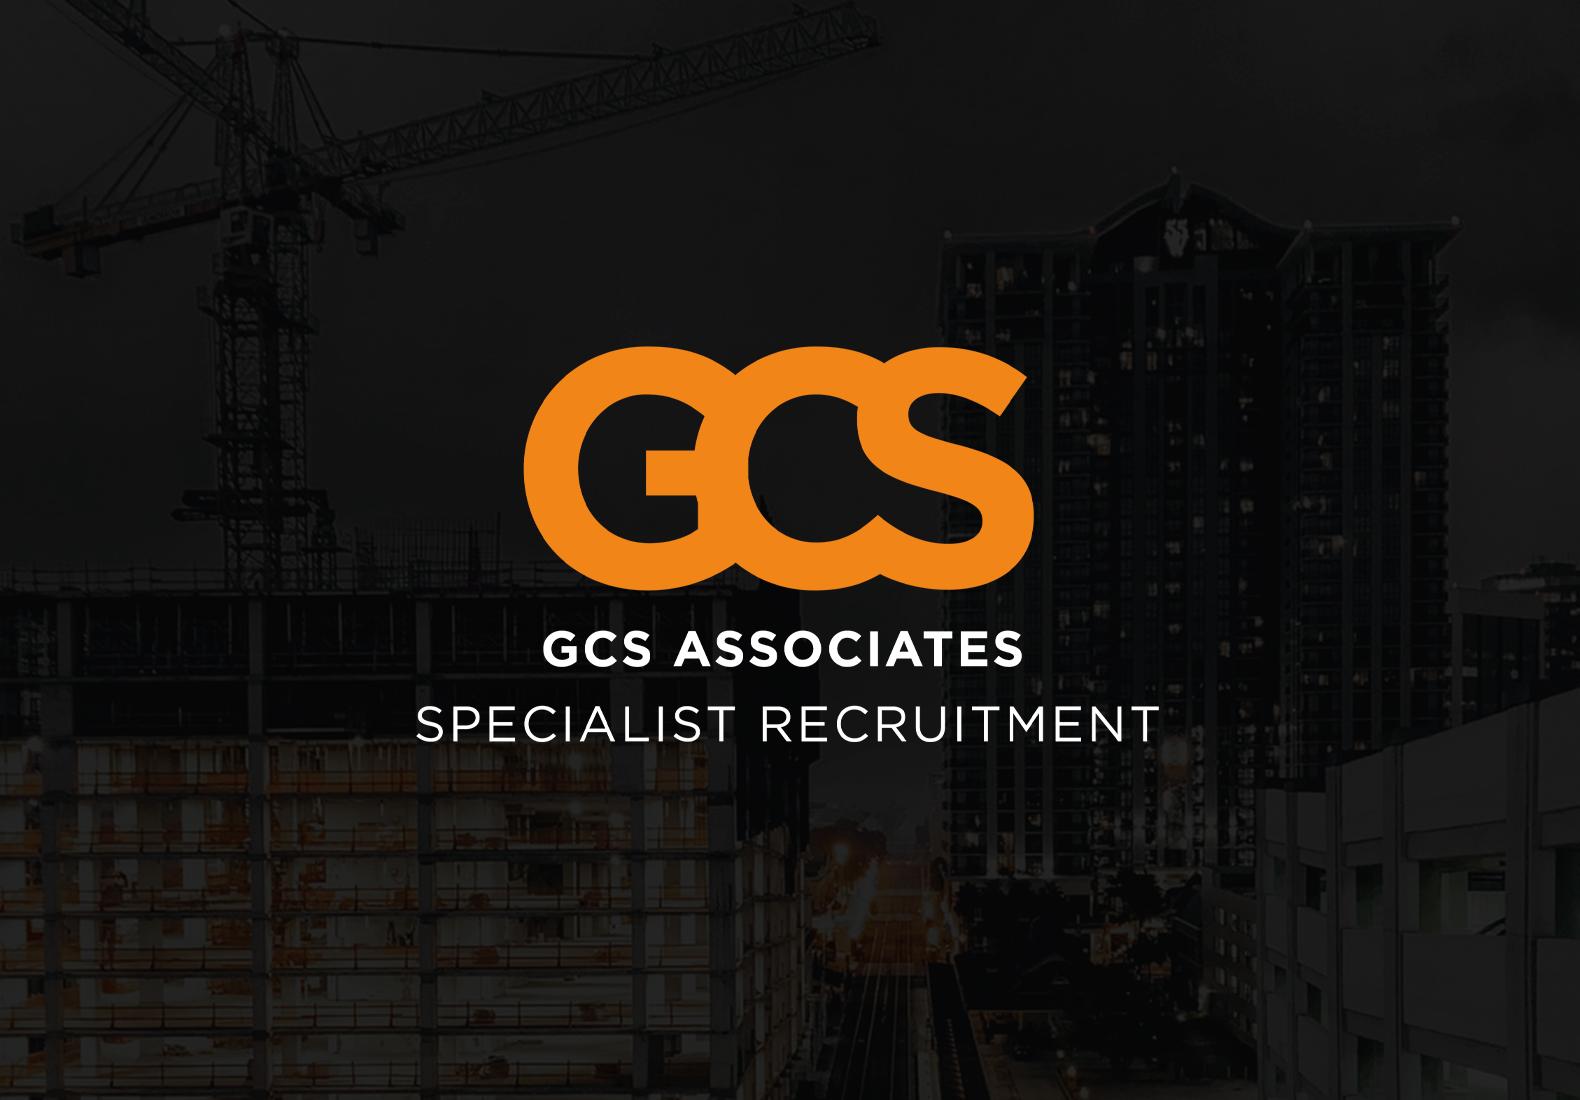 GCS Associates case study design development logo website branding icon illustration construction building property